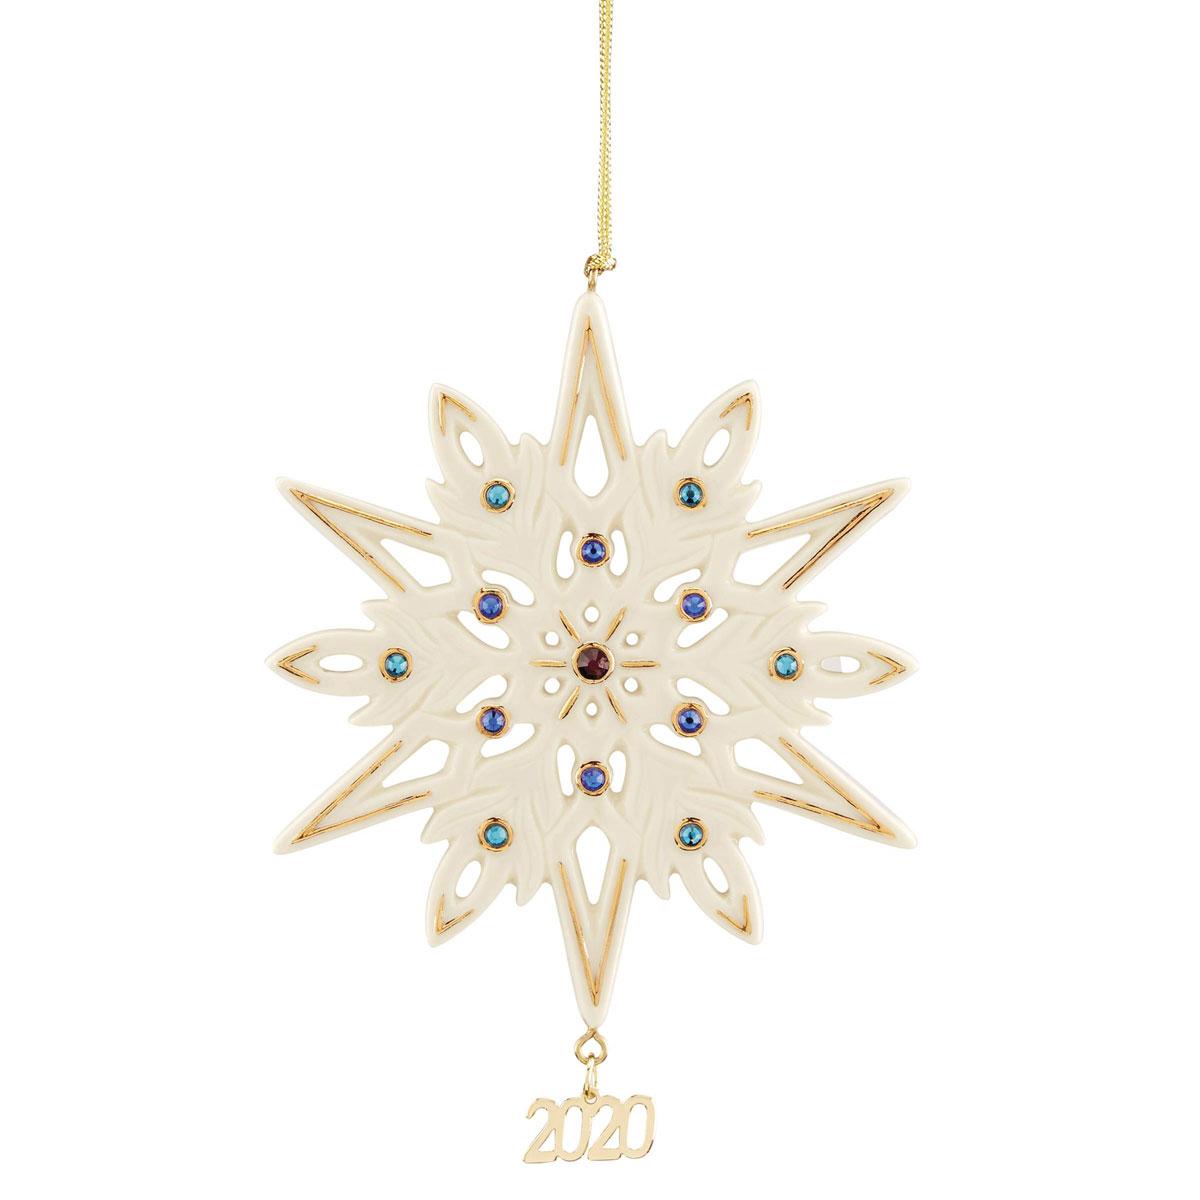 Lenox Gemmed 2020 Snowflake Ornament